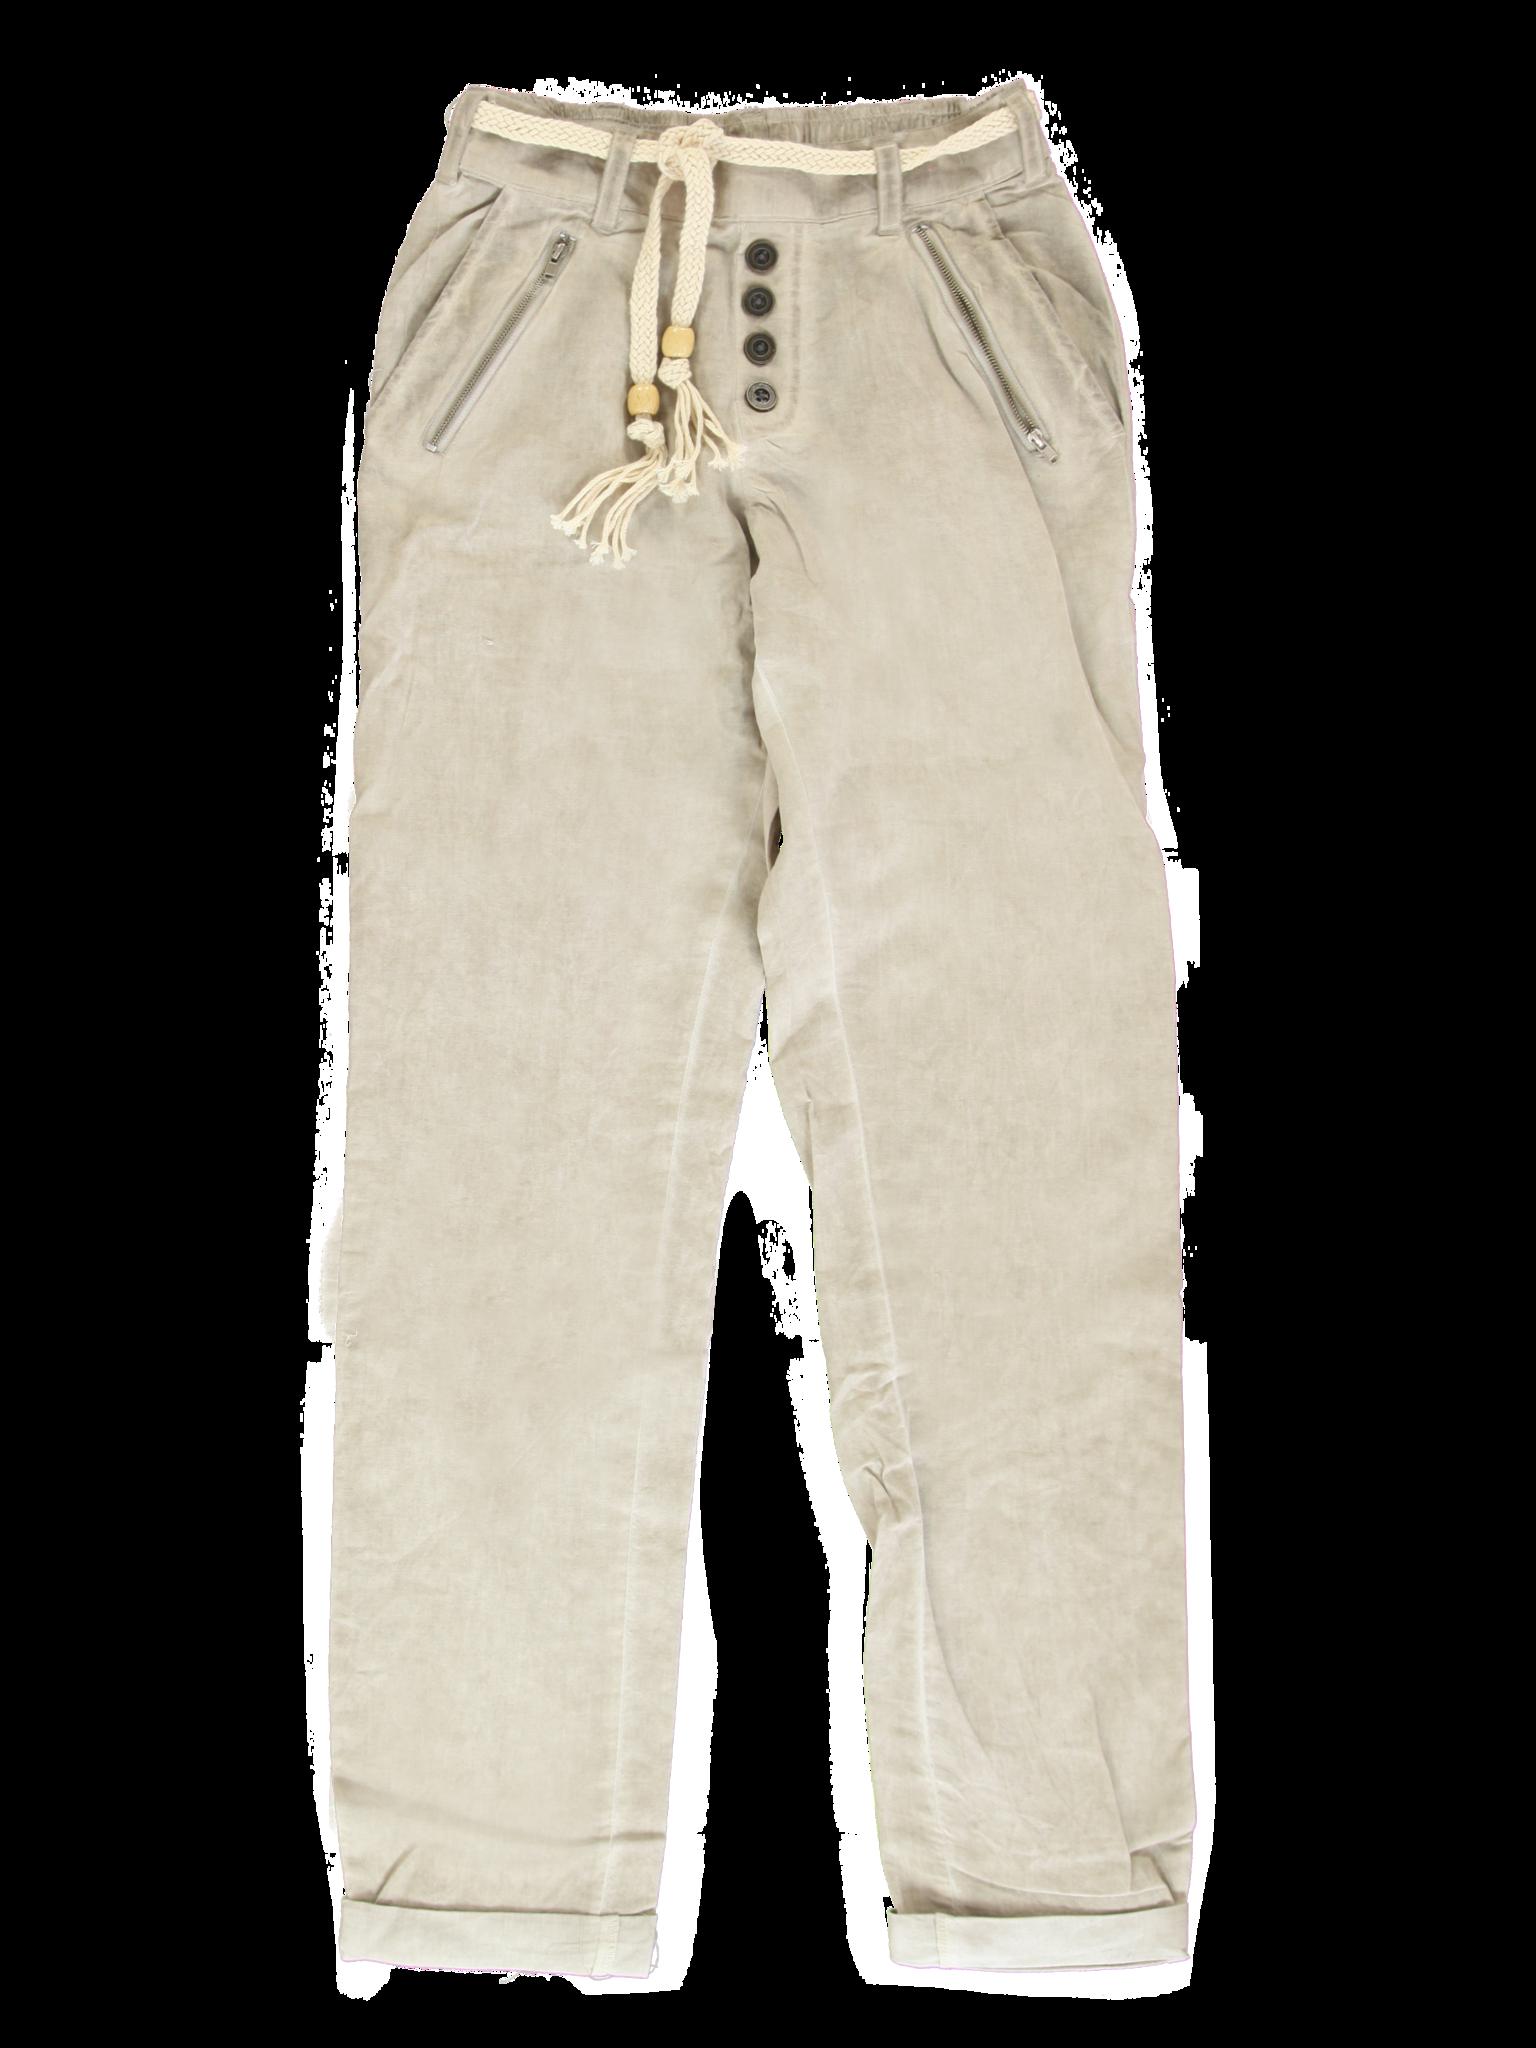 All Brands | Summerproducts Ladies | Pants | 18 pcs/box